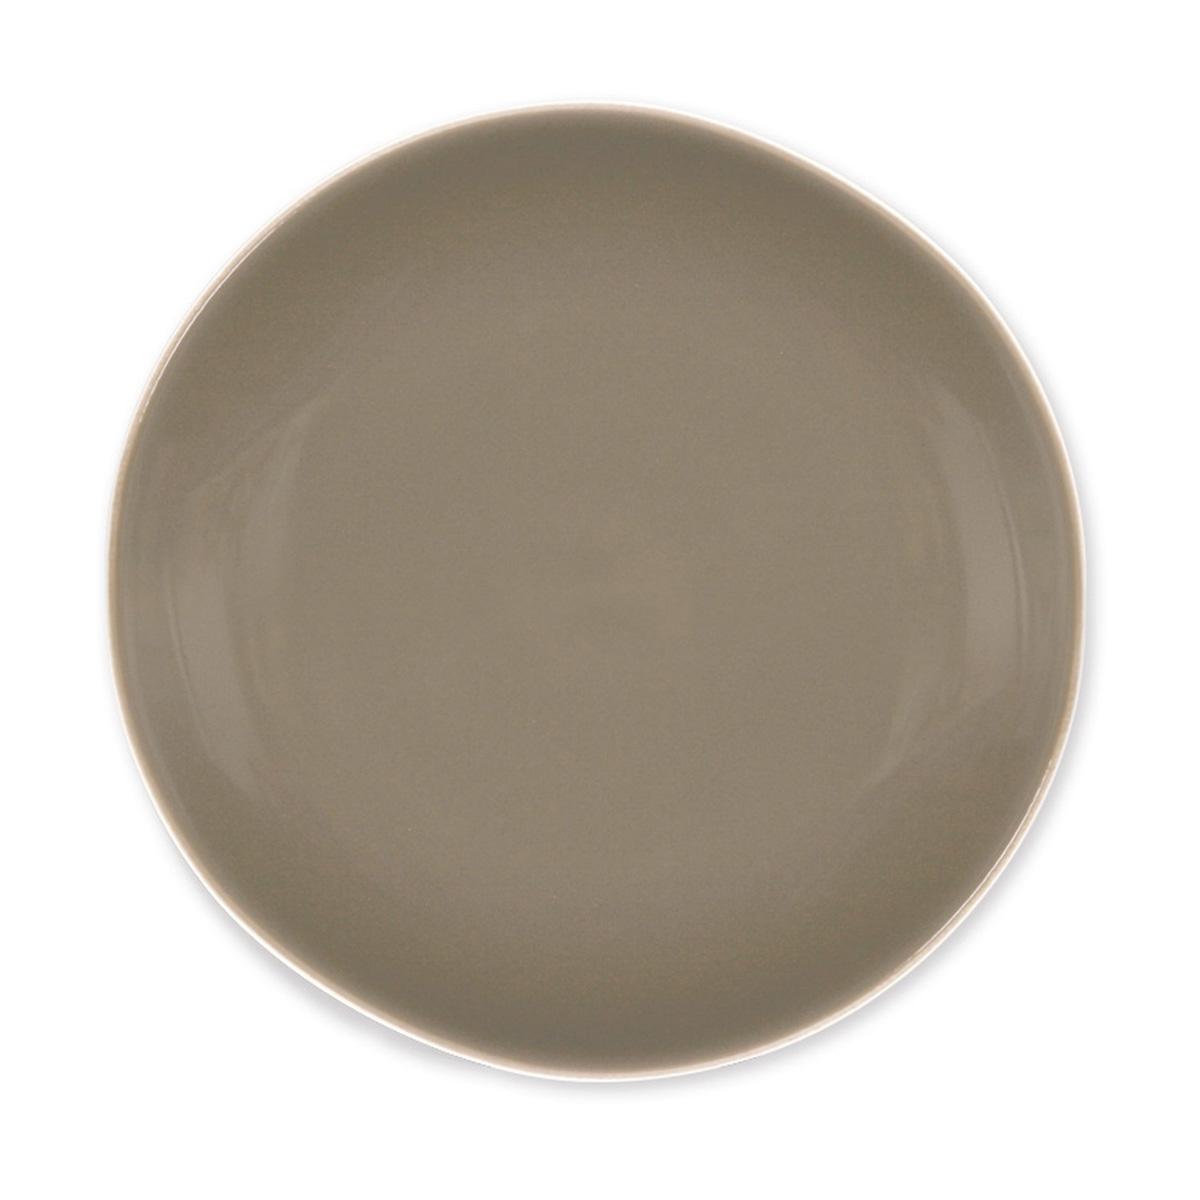 assiette dessert en fa ence vaisselle contemporaine bruno evrard. Black Bedroom Furniture Sets. Home Design Ideas